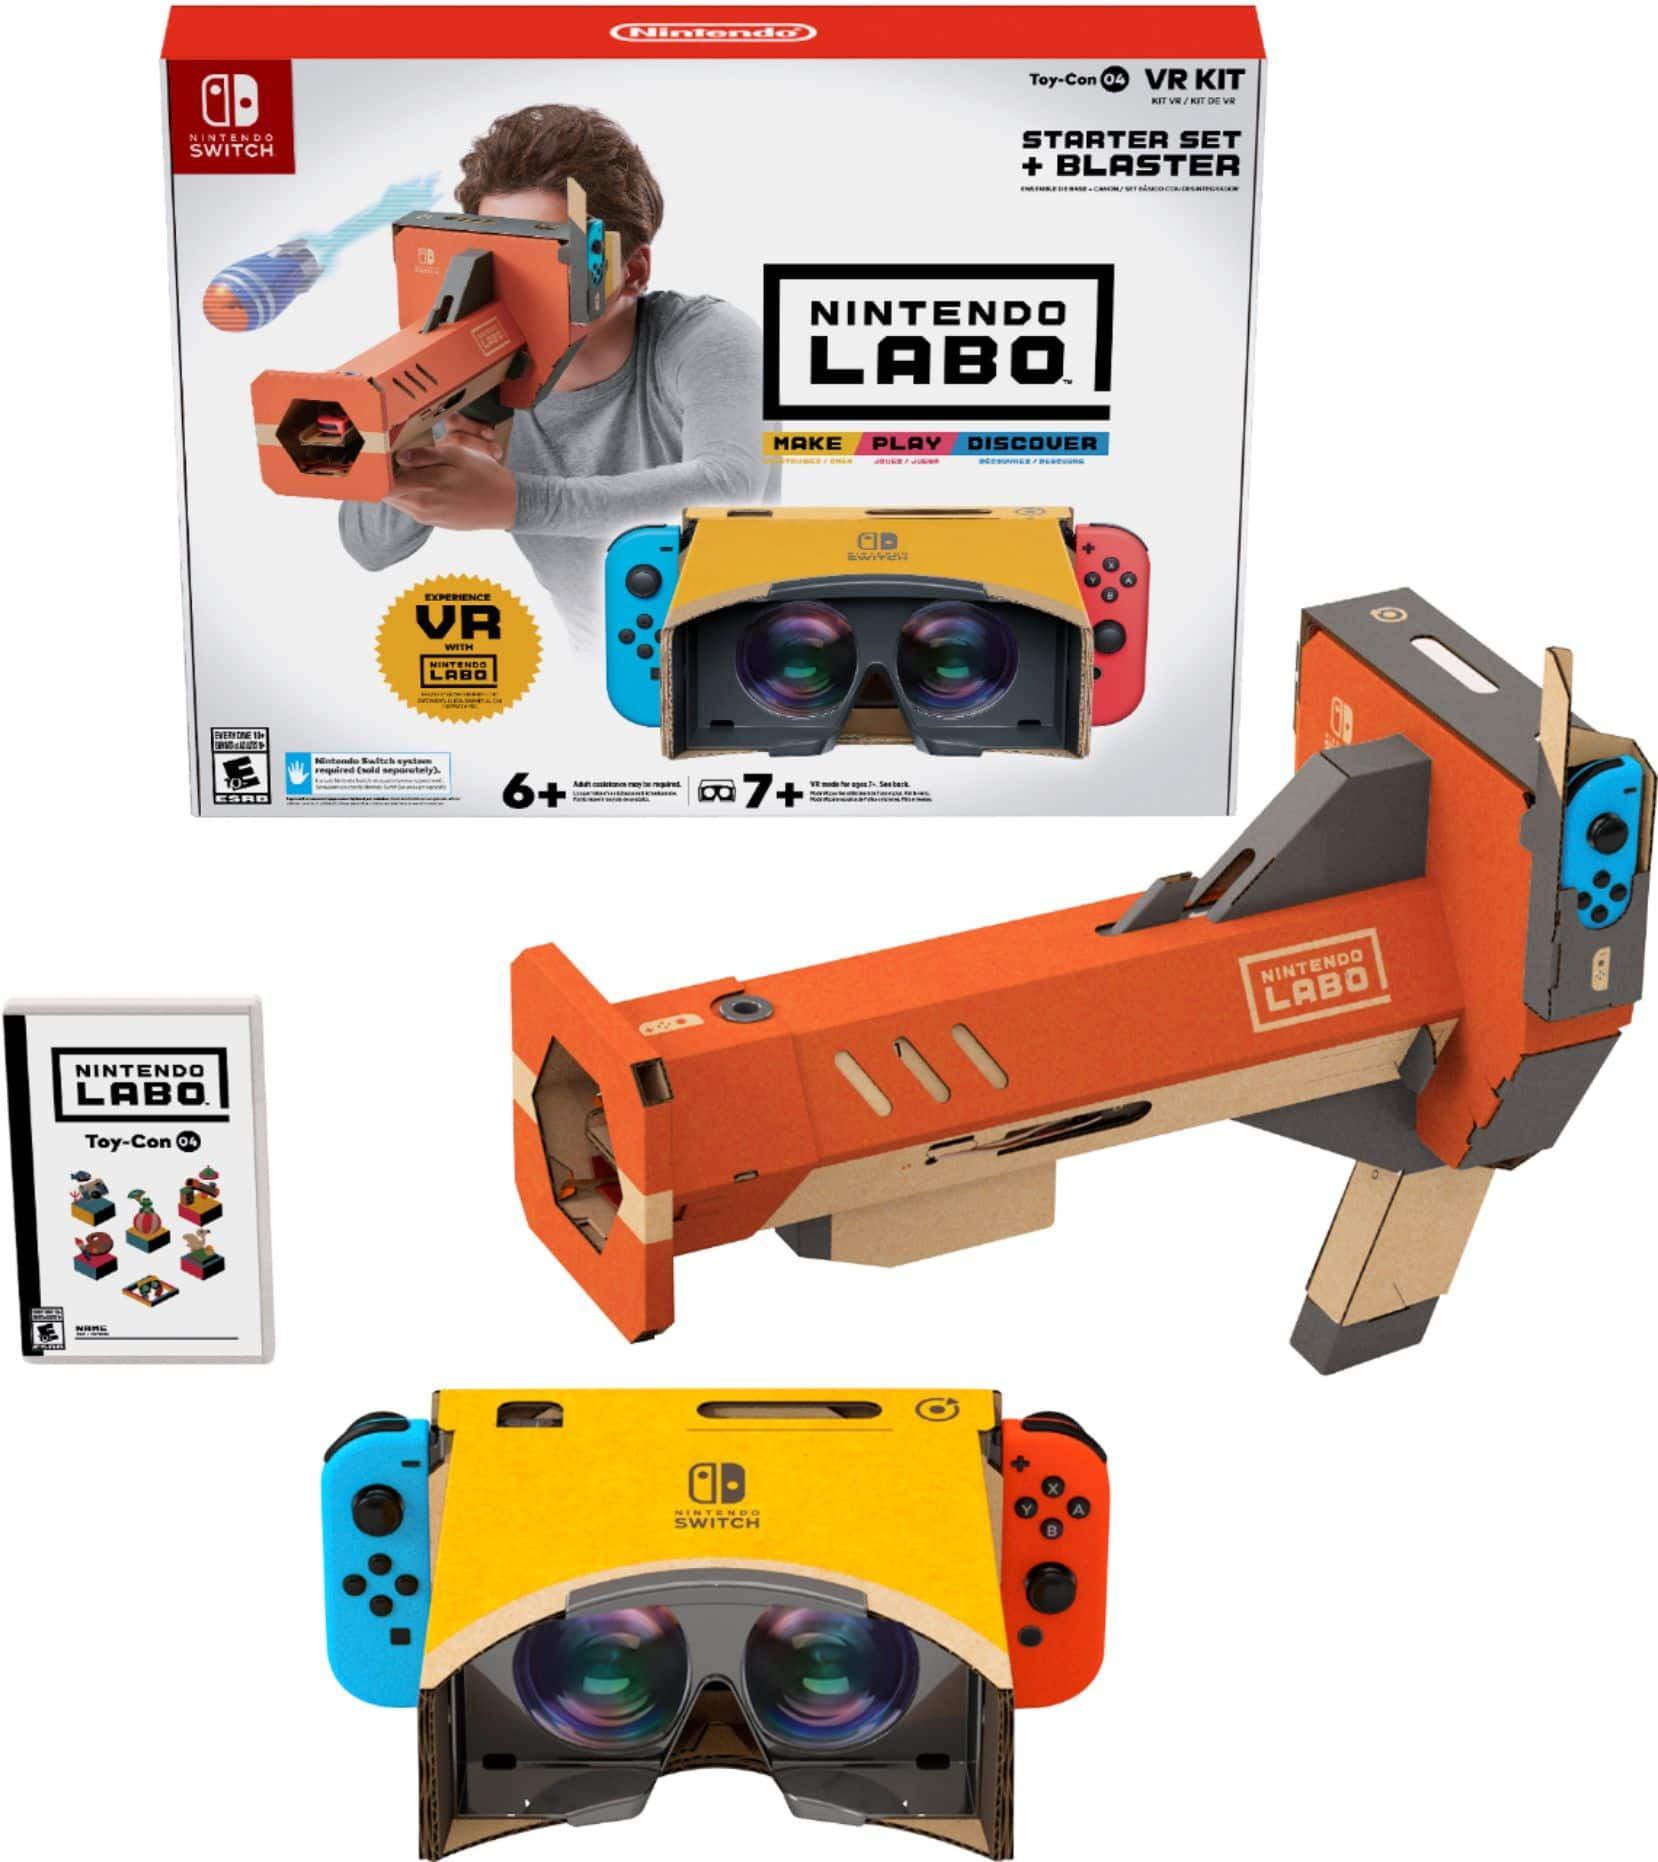 Labo Toy-Con 04: VR Kit - Starter Set + Blaster - Nintendo Switch Best Buy $19.99